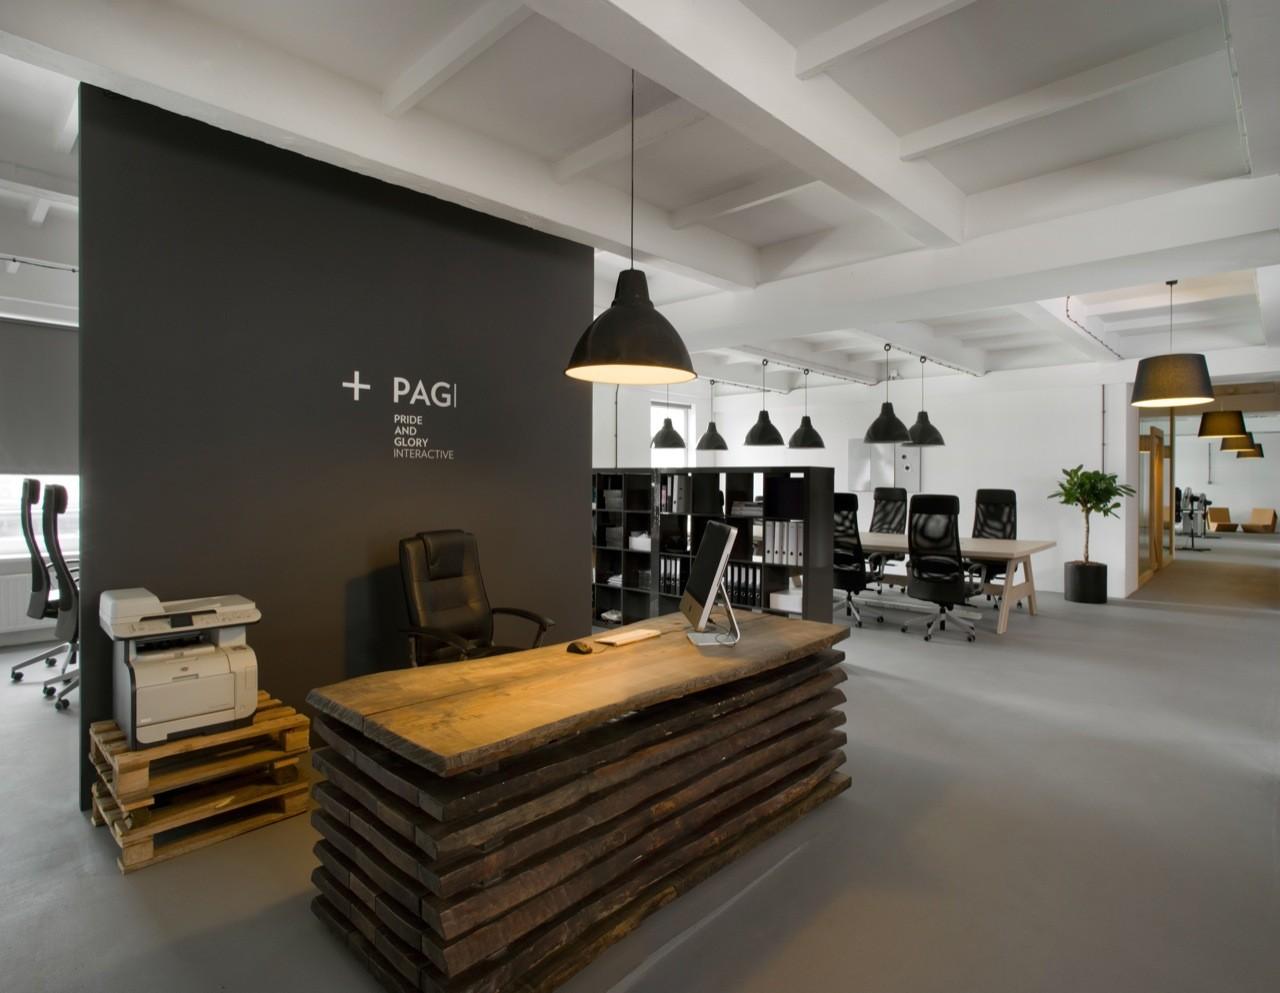 reclaimed-wood-reception-desk-by-morpho-studio.jpg